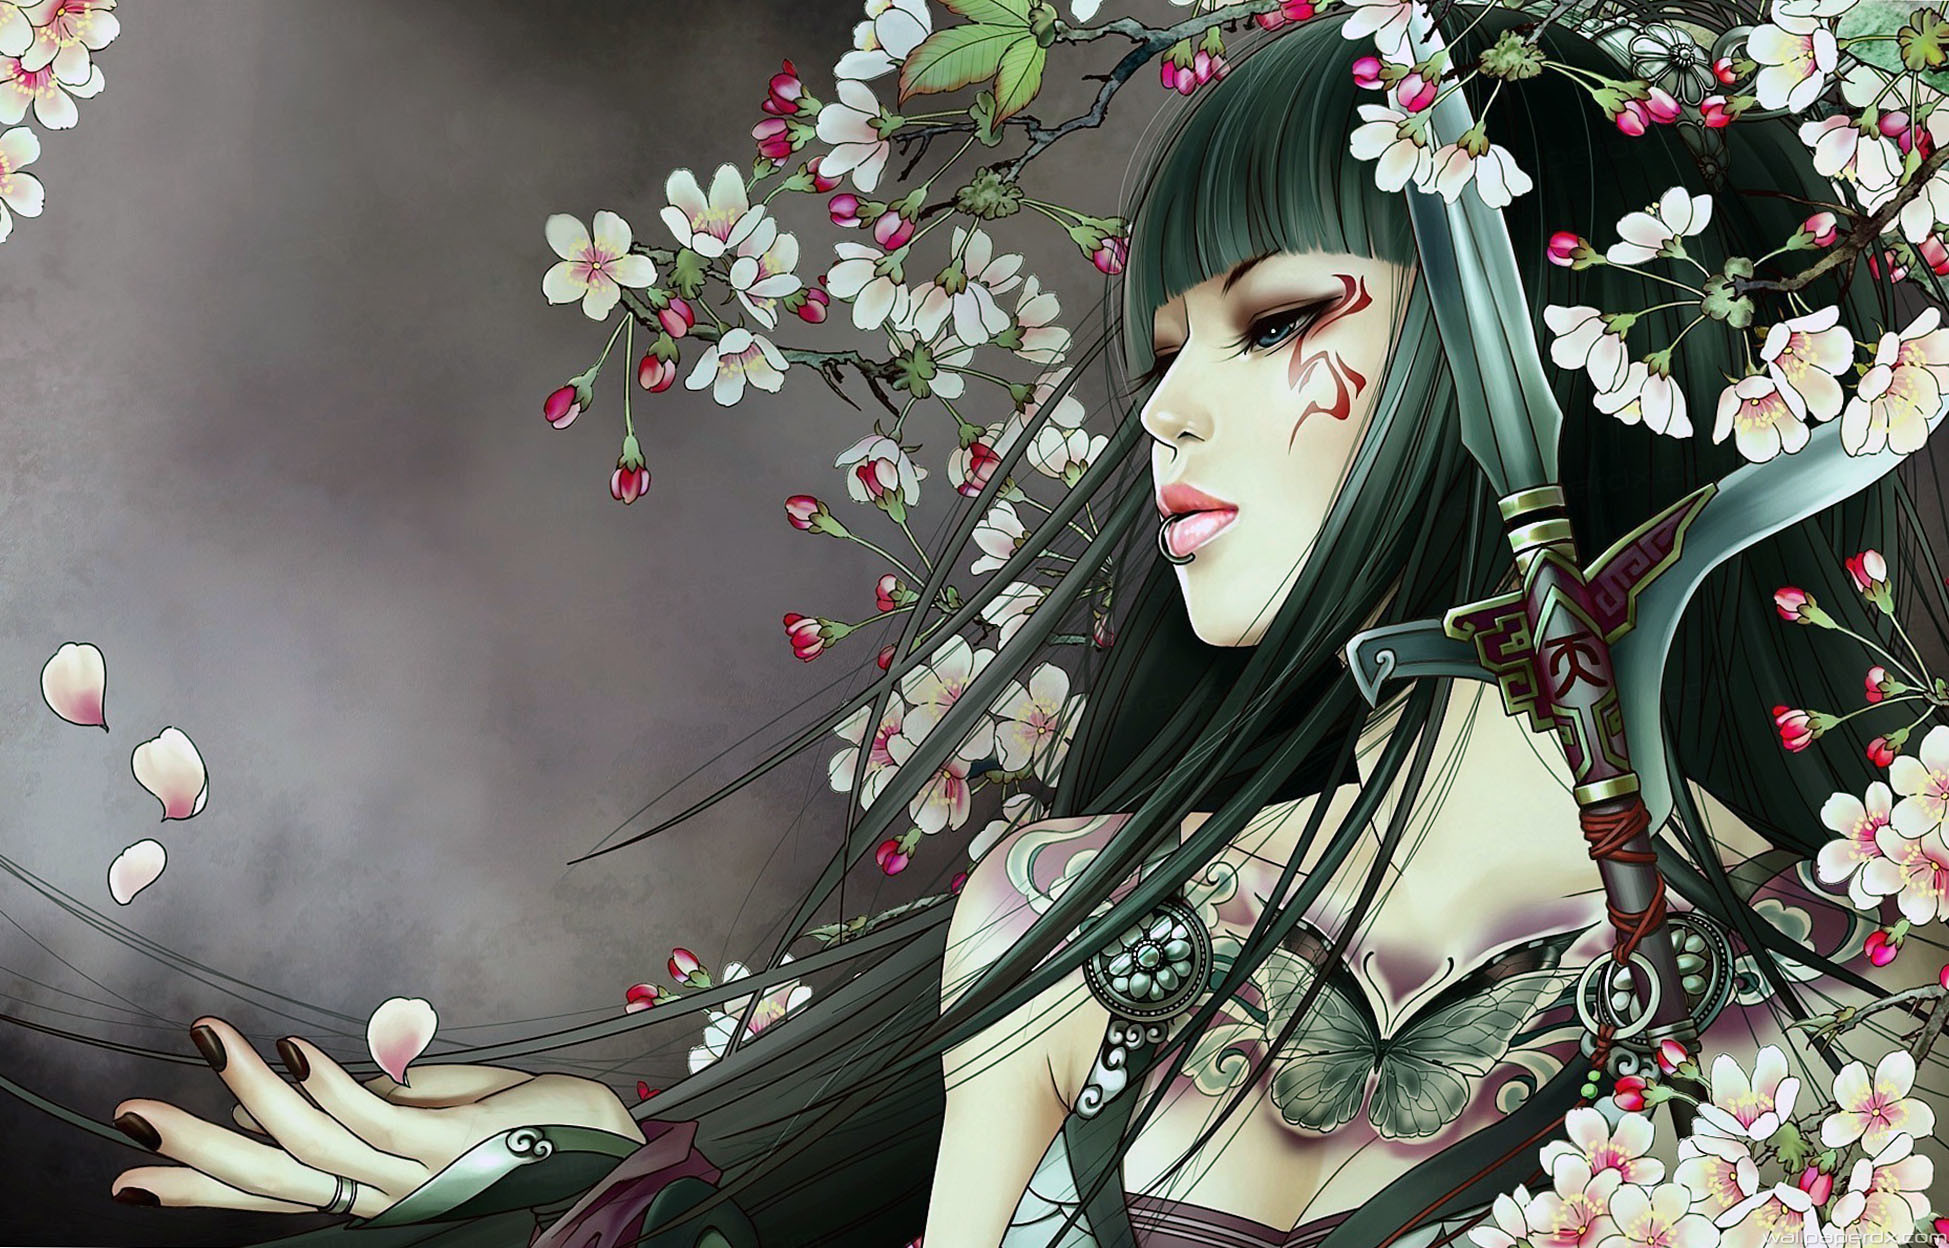 Res: 1949x1248, samurai girl with tattoo full hd wallpaper